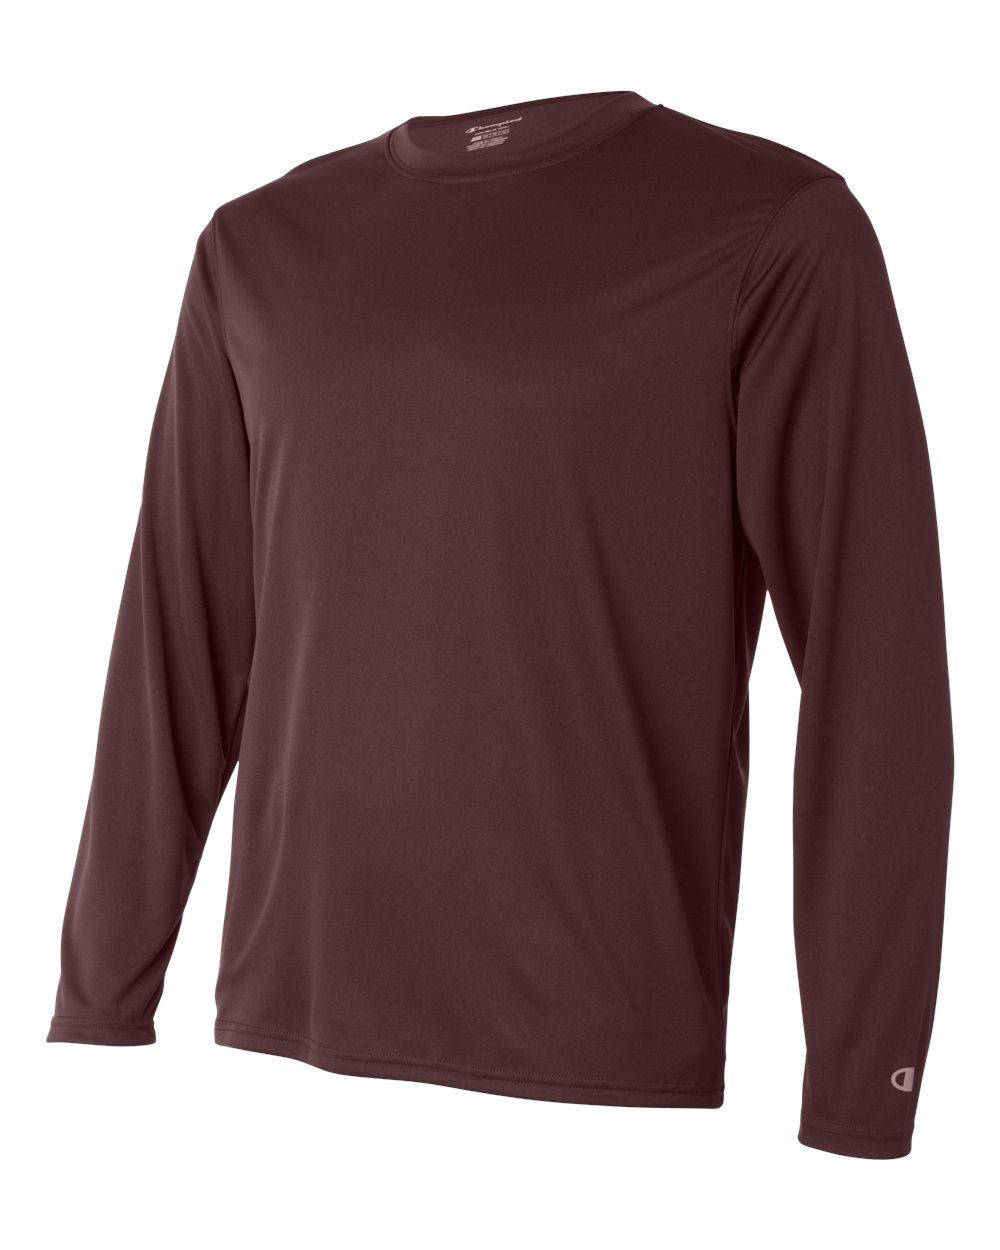 Champion-Men-039-s-Double-Dry-4-1-oz-Long-Sleeve-Interlock-T-Shirt-CW26-XS-3XL thumbnail 10